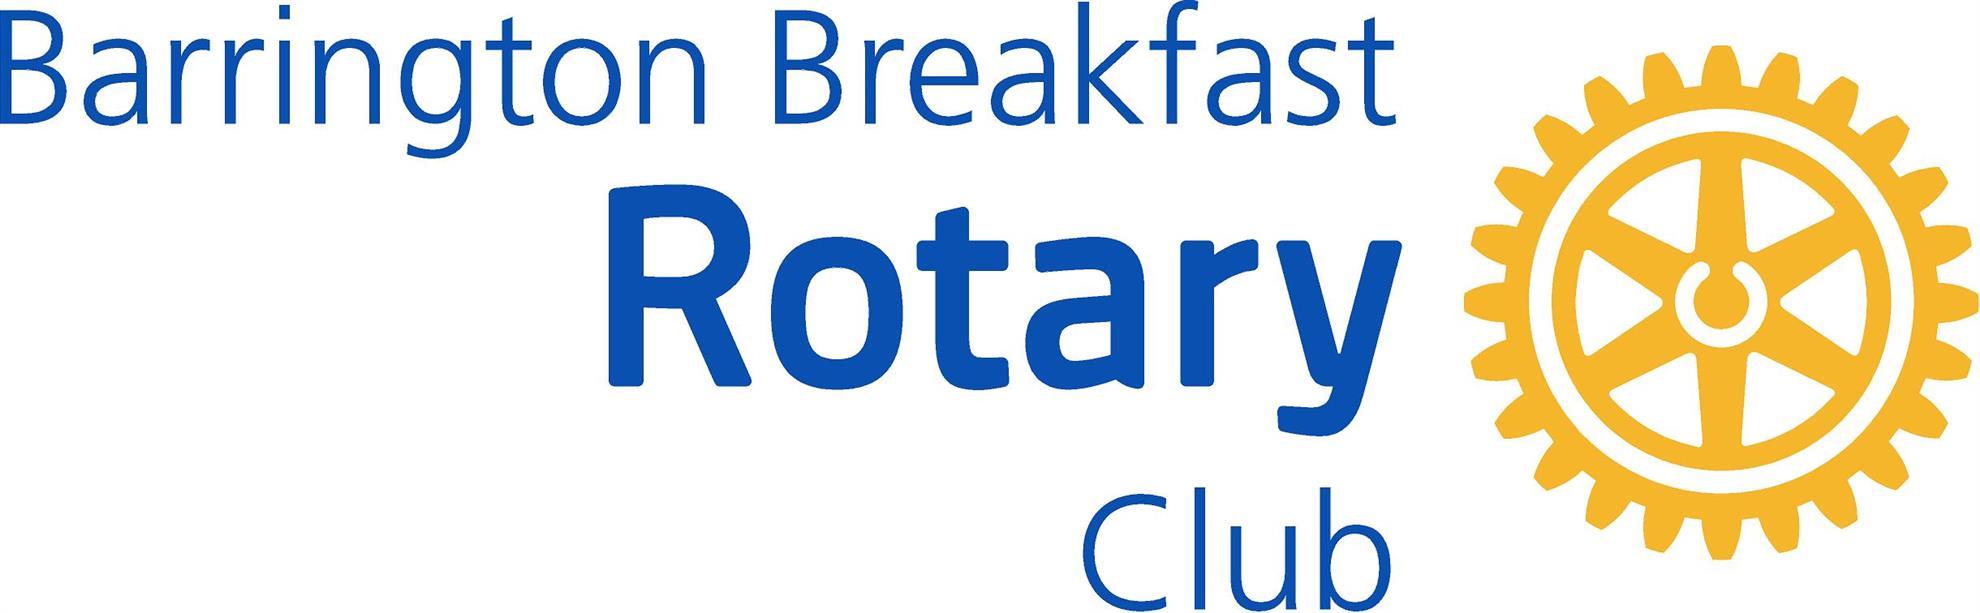 Barrington Breakfast logo